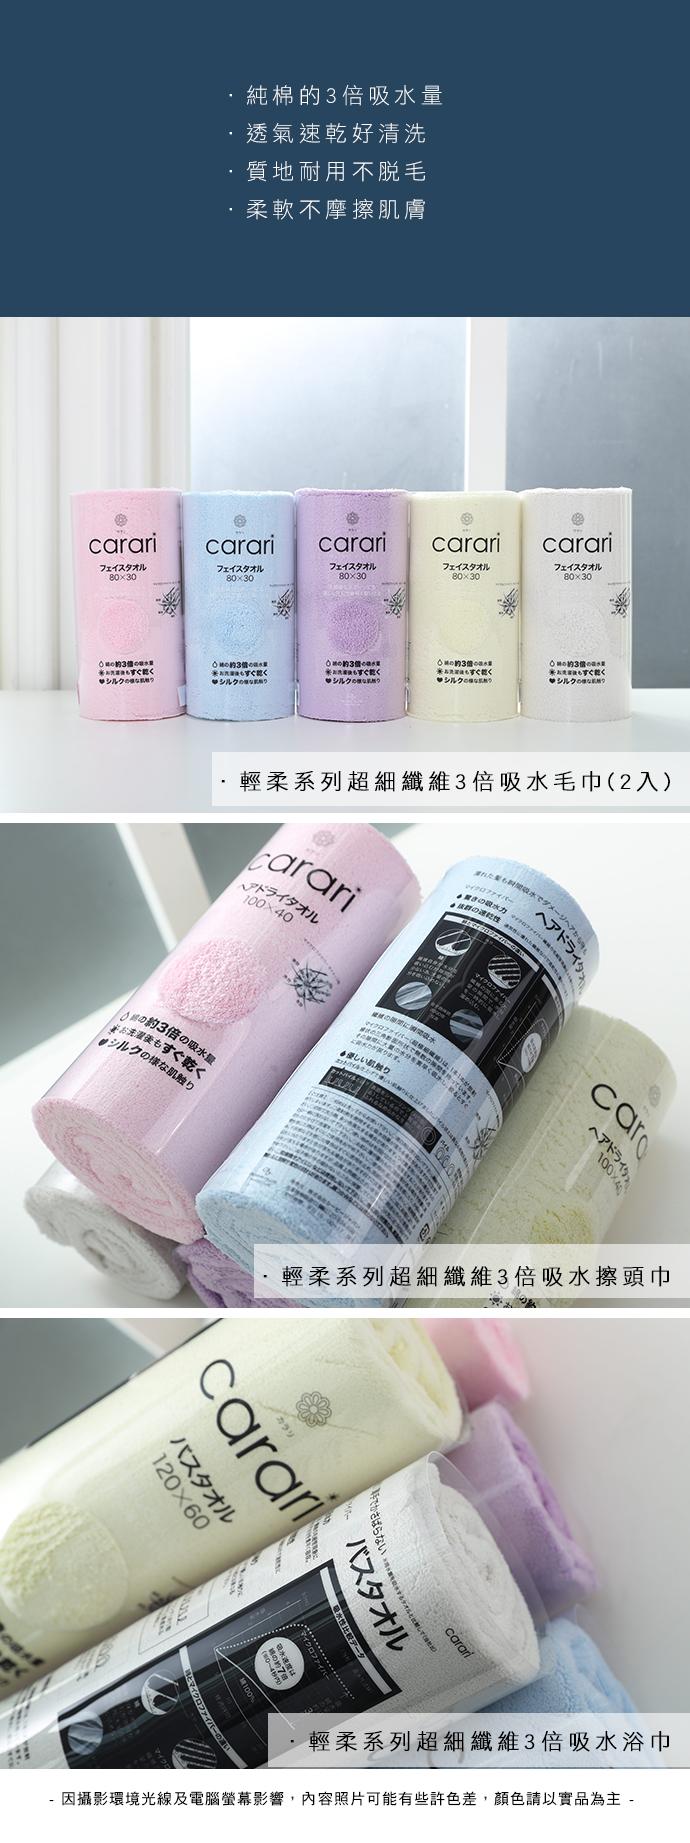 CB Japan|輕柔系列超細纖維3倍吸水毛巾 (2入) - 甜心粉